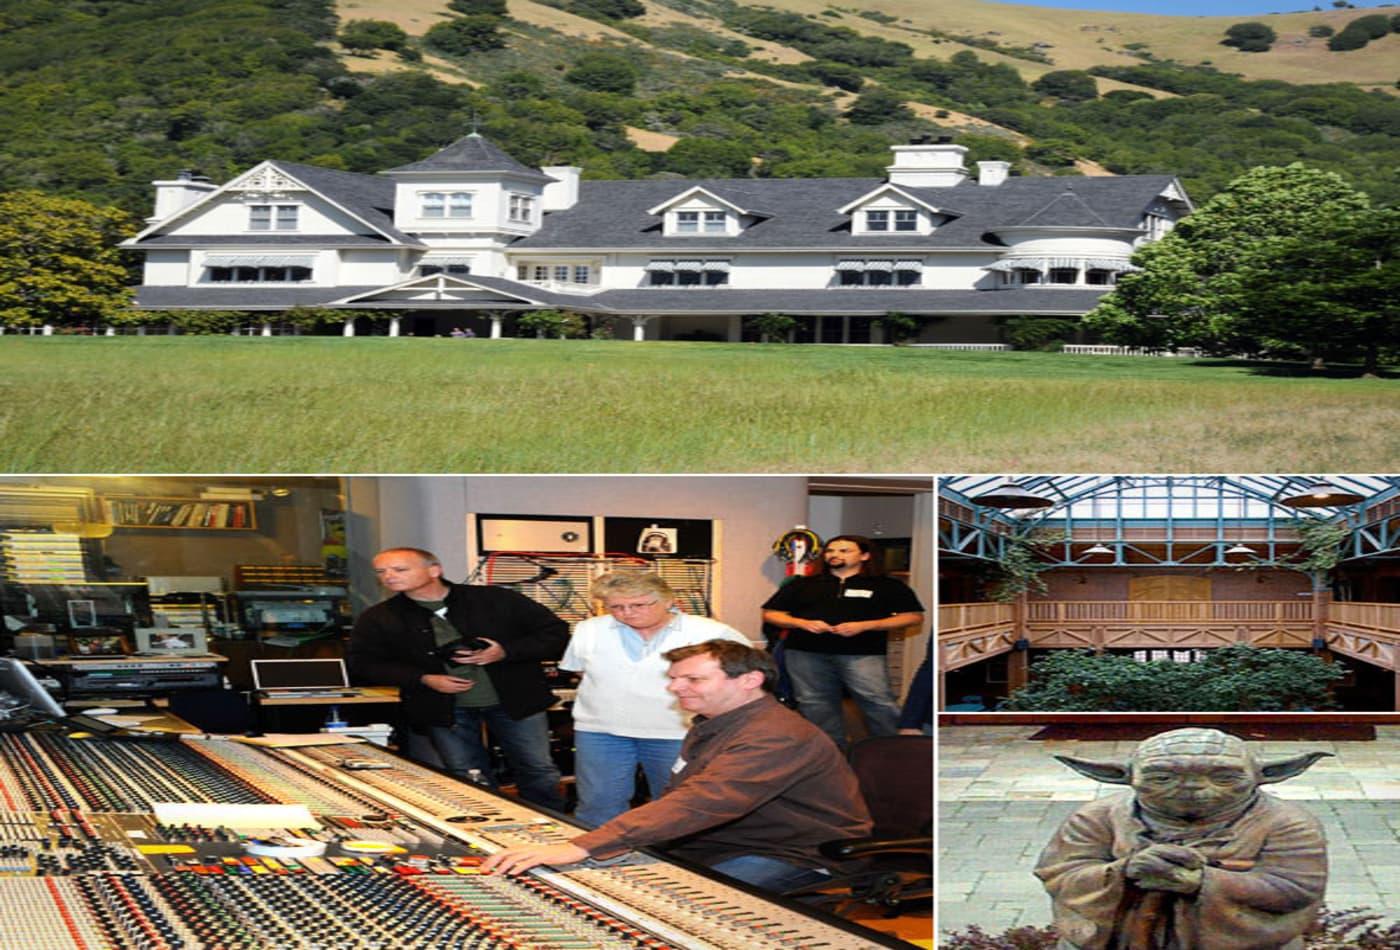 Skywalker-Ranch-Marin-County-Coolest-Corporate-Headquarters-CNBC.jpg